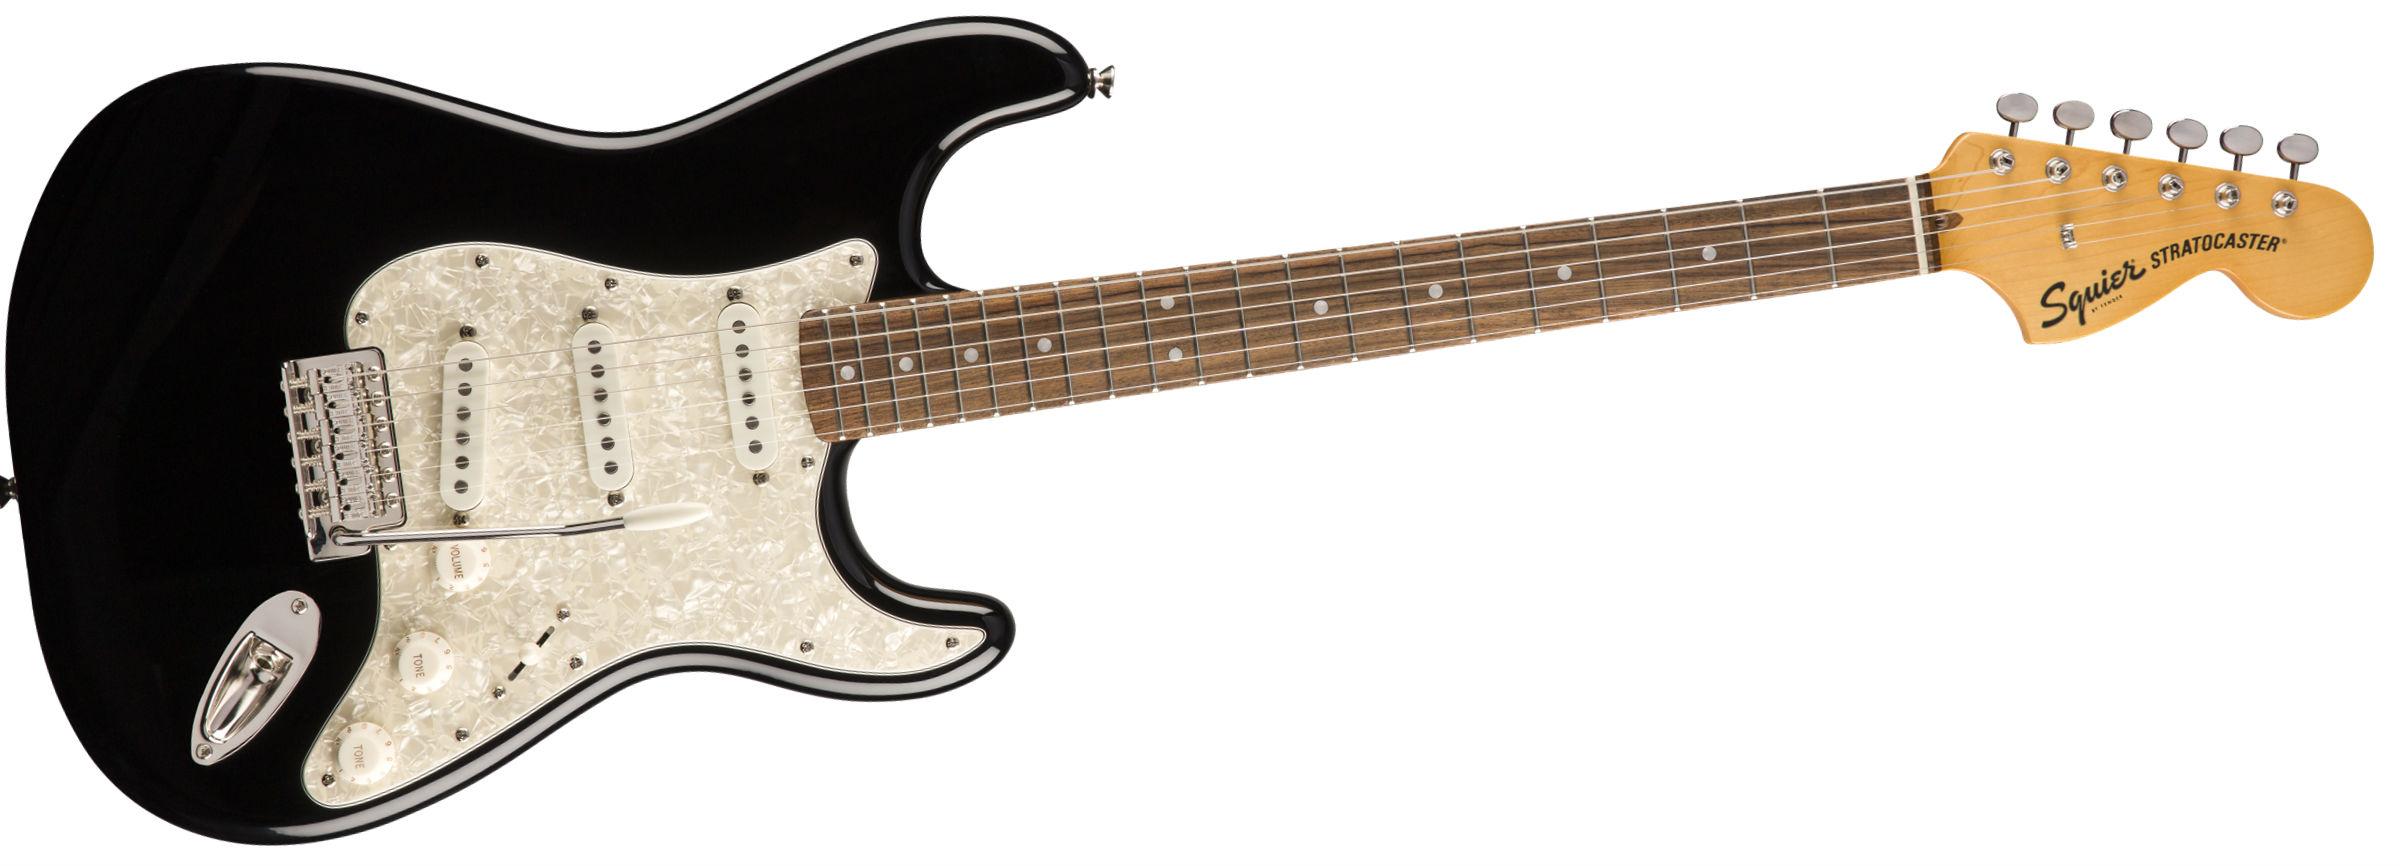 SQUIER-Classic-Vibe-70s-Stratocaster-LF-Black-0374020506-sku-22875